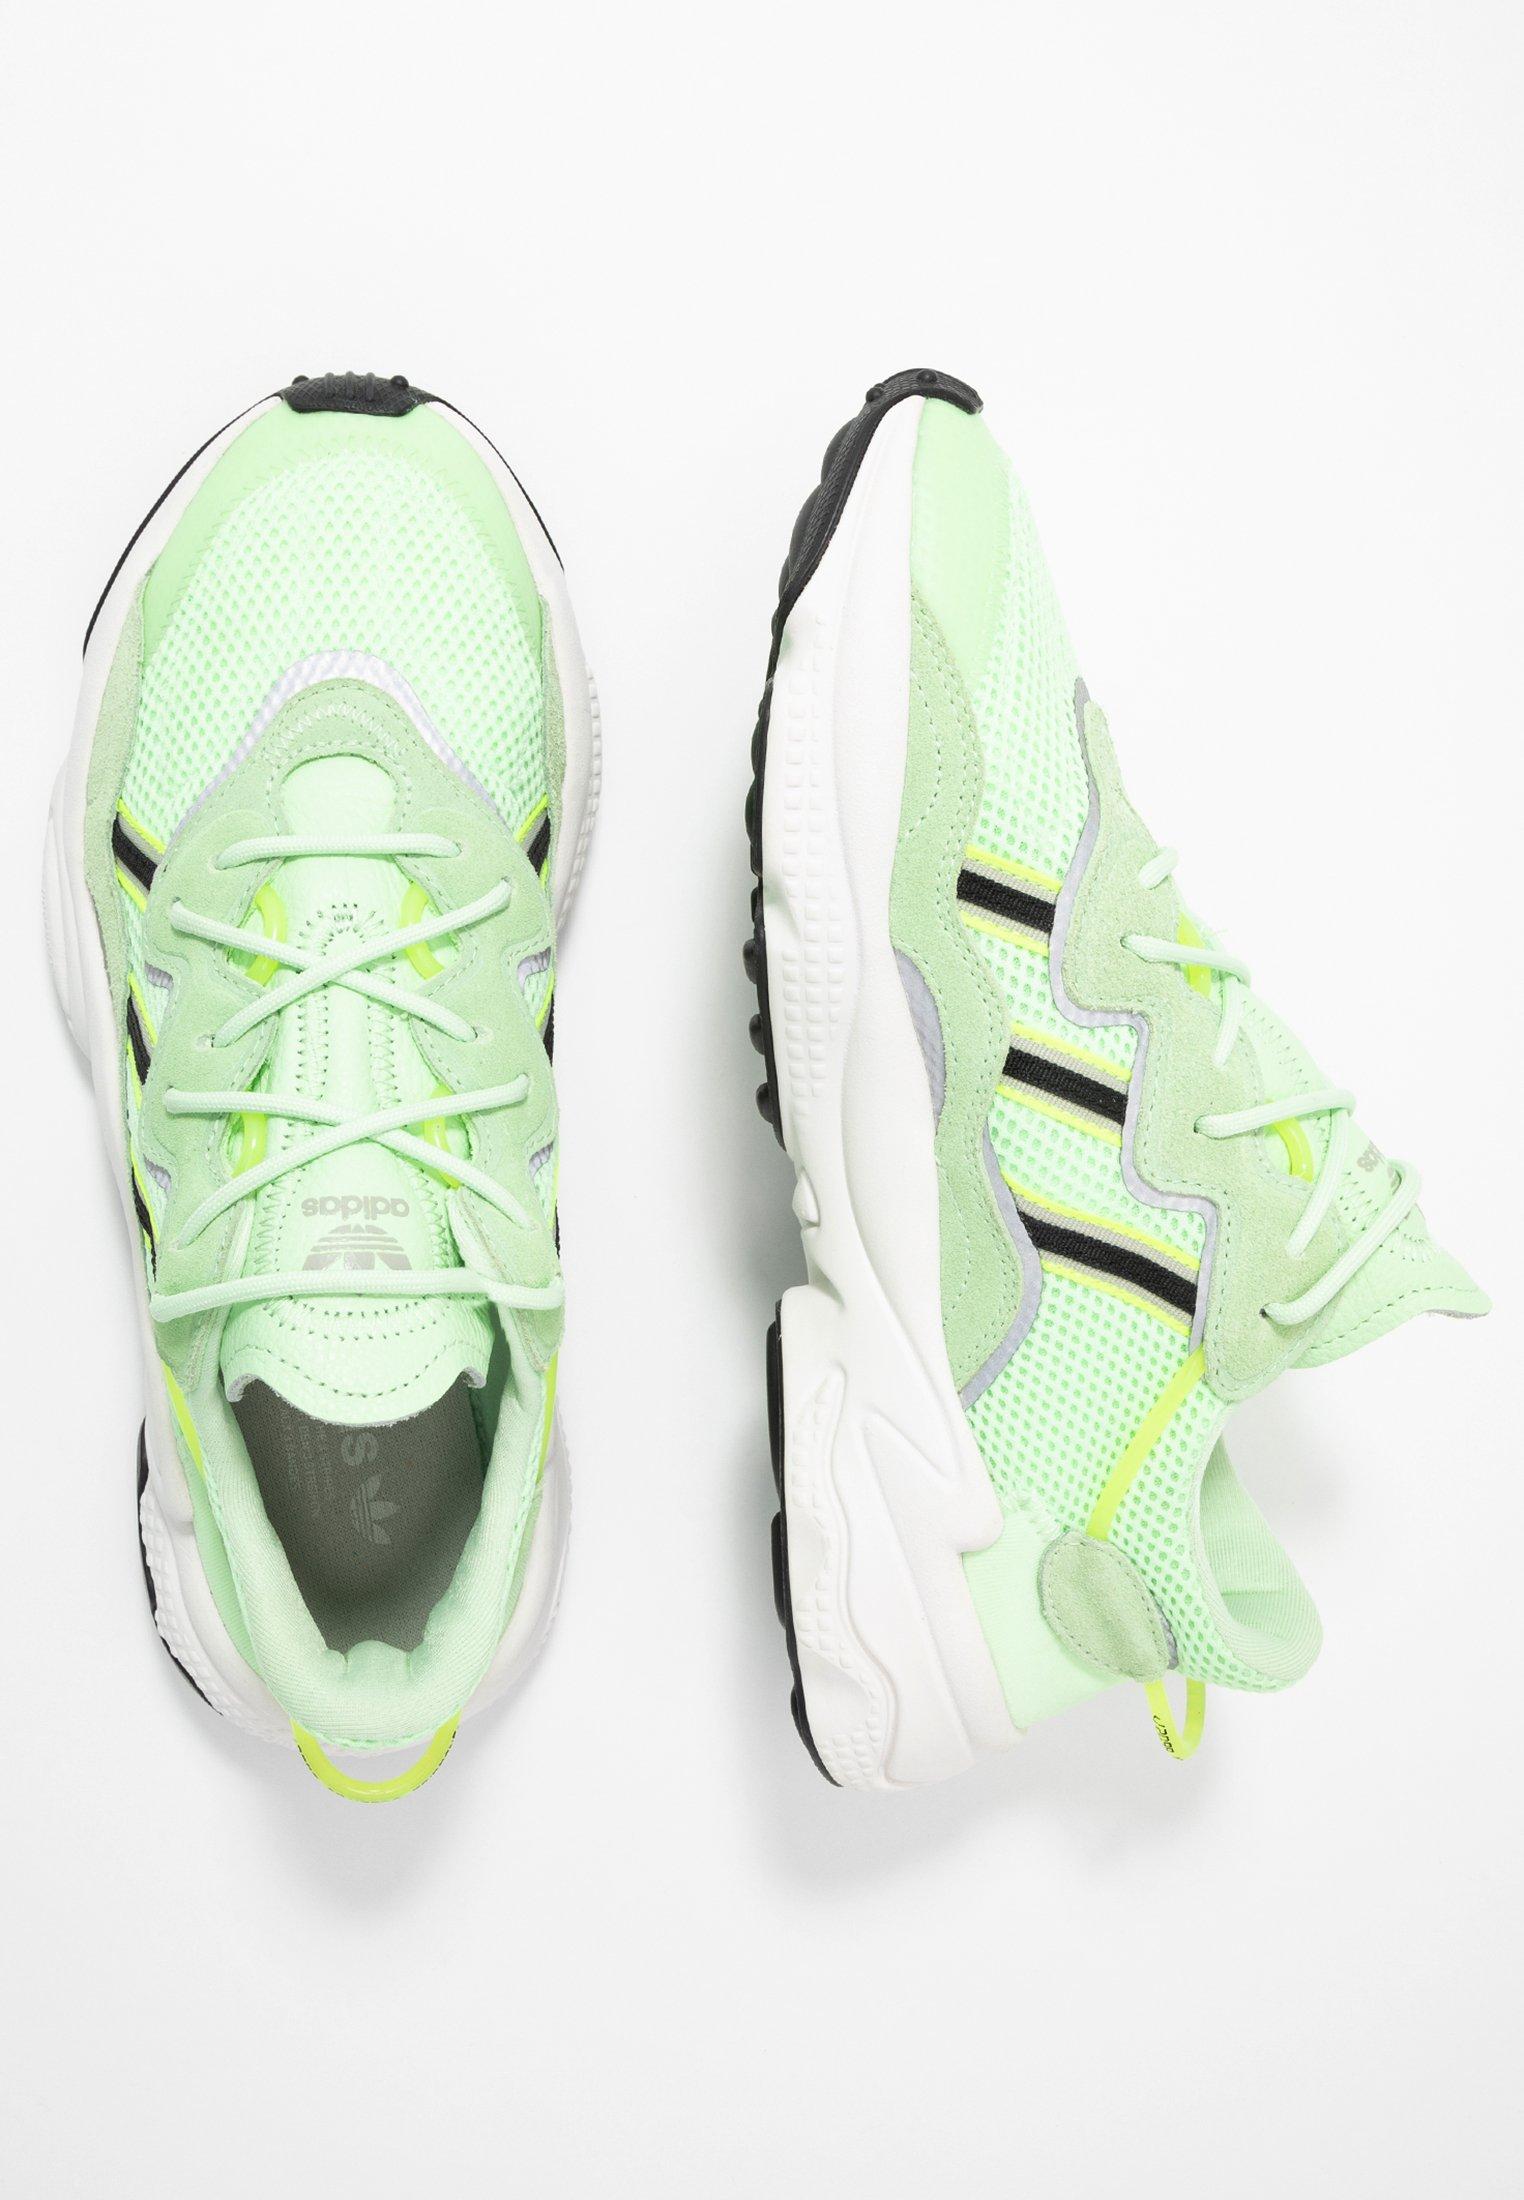 Svart + Grønn EQT + Falcon Sko | adidas NO